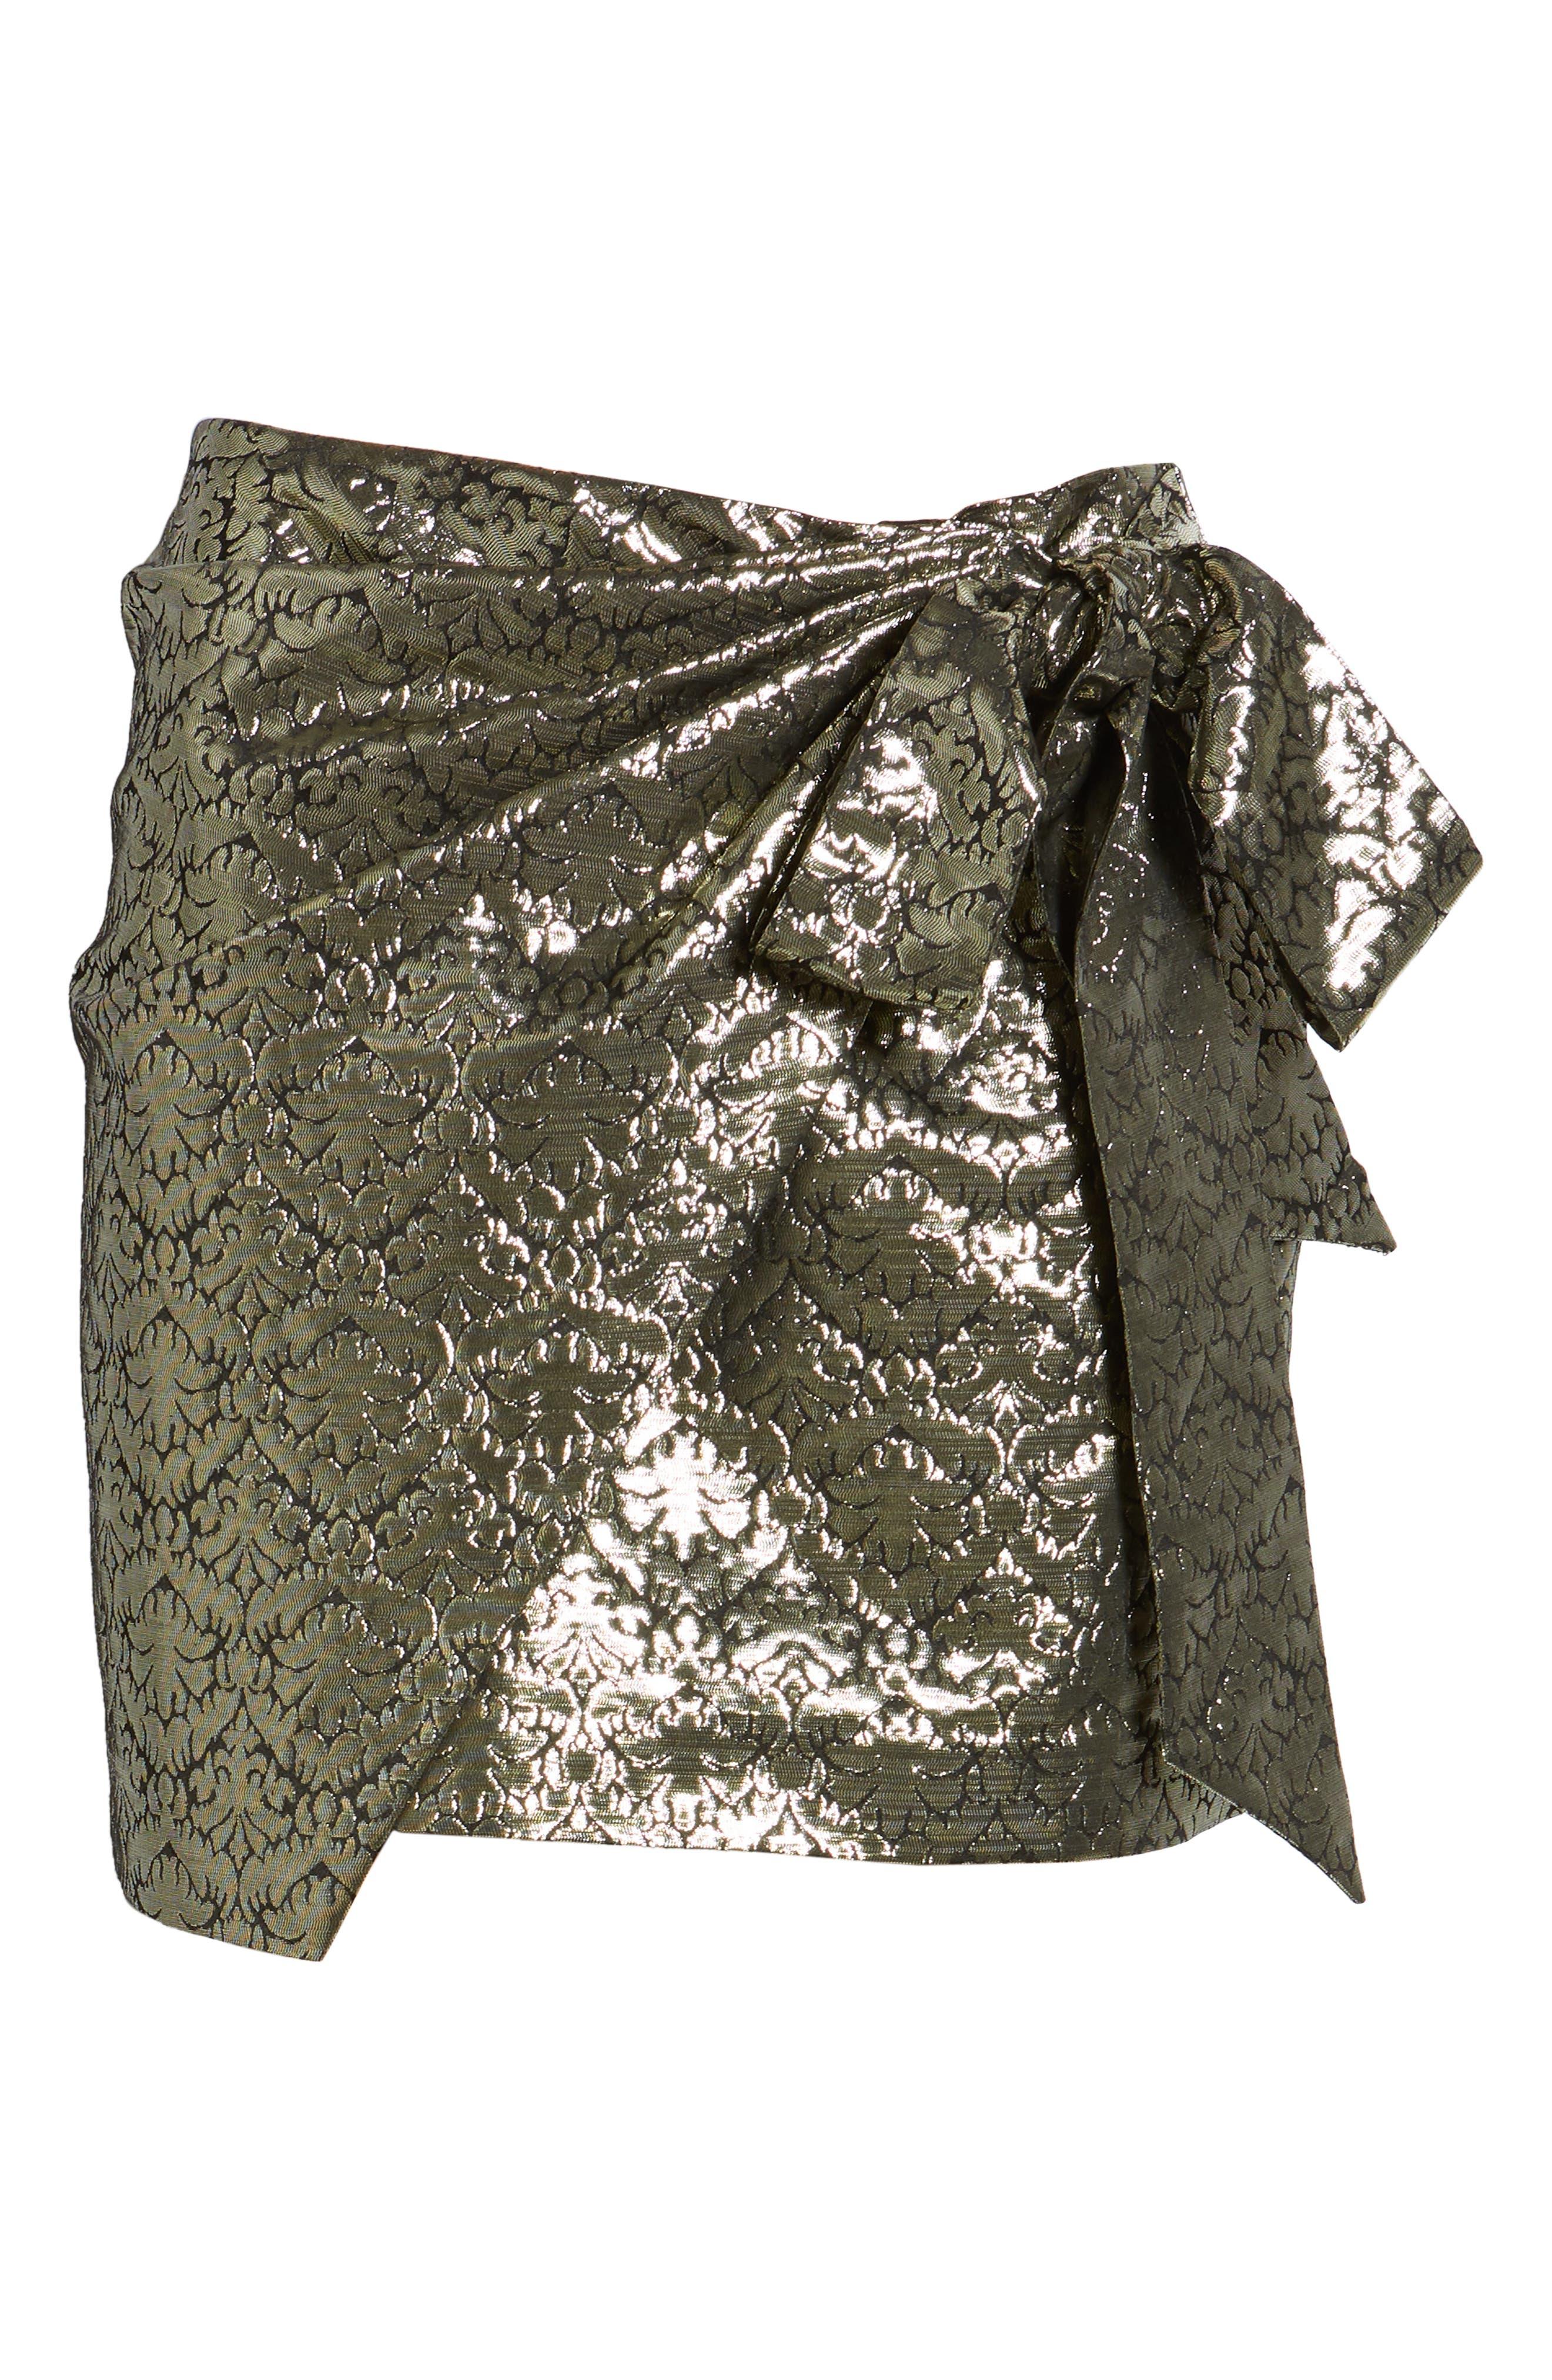 REBECCA MINKOFF, Augustina Shimmering Jacquard Faux Wrap Skirt, Alternate thumbnail 6, color, 710